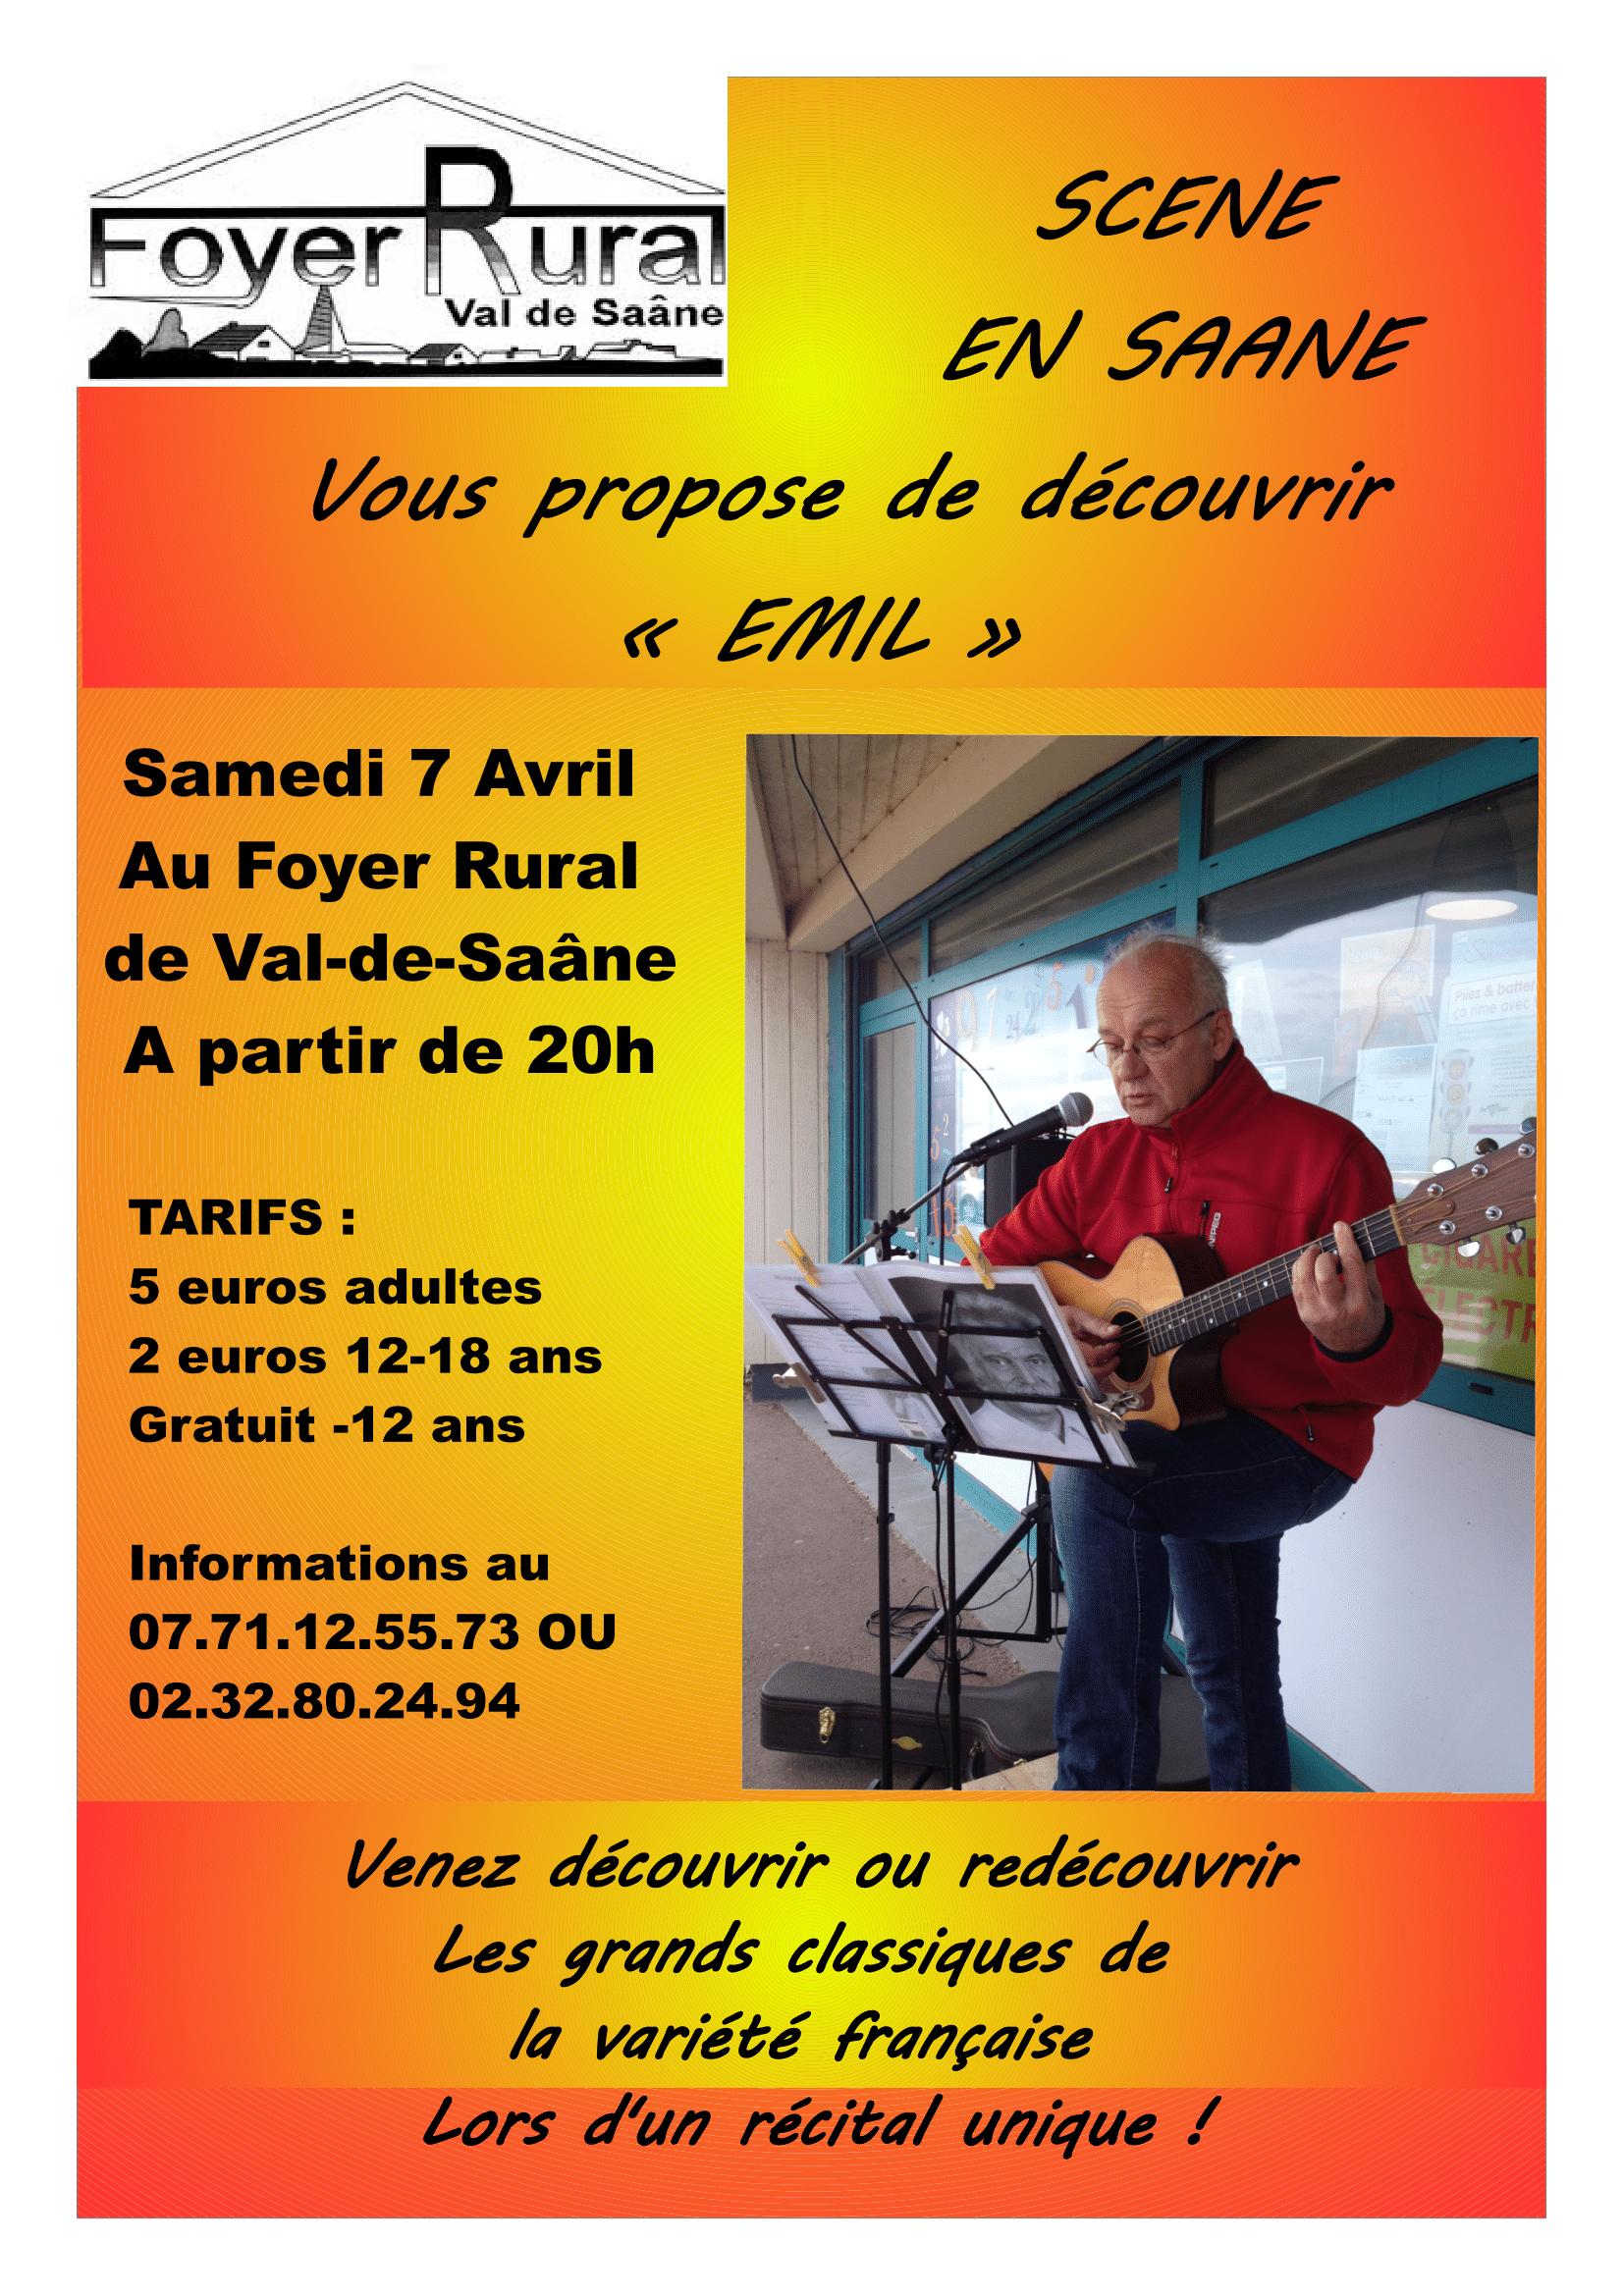 Scène en Saâne – Samedi 7 Avril 2018